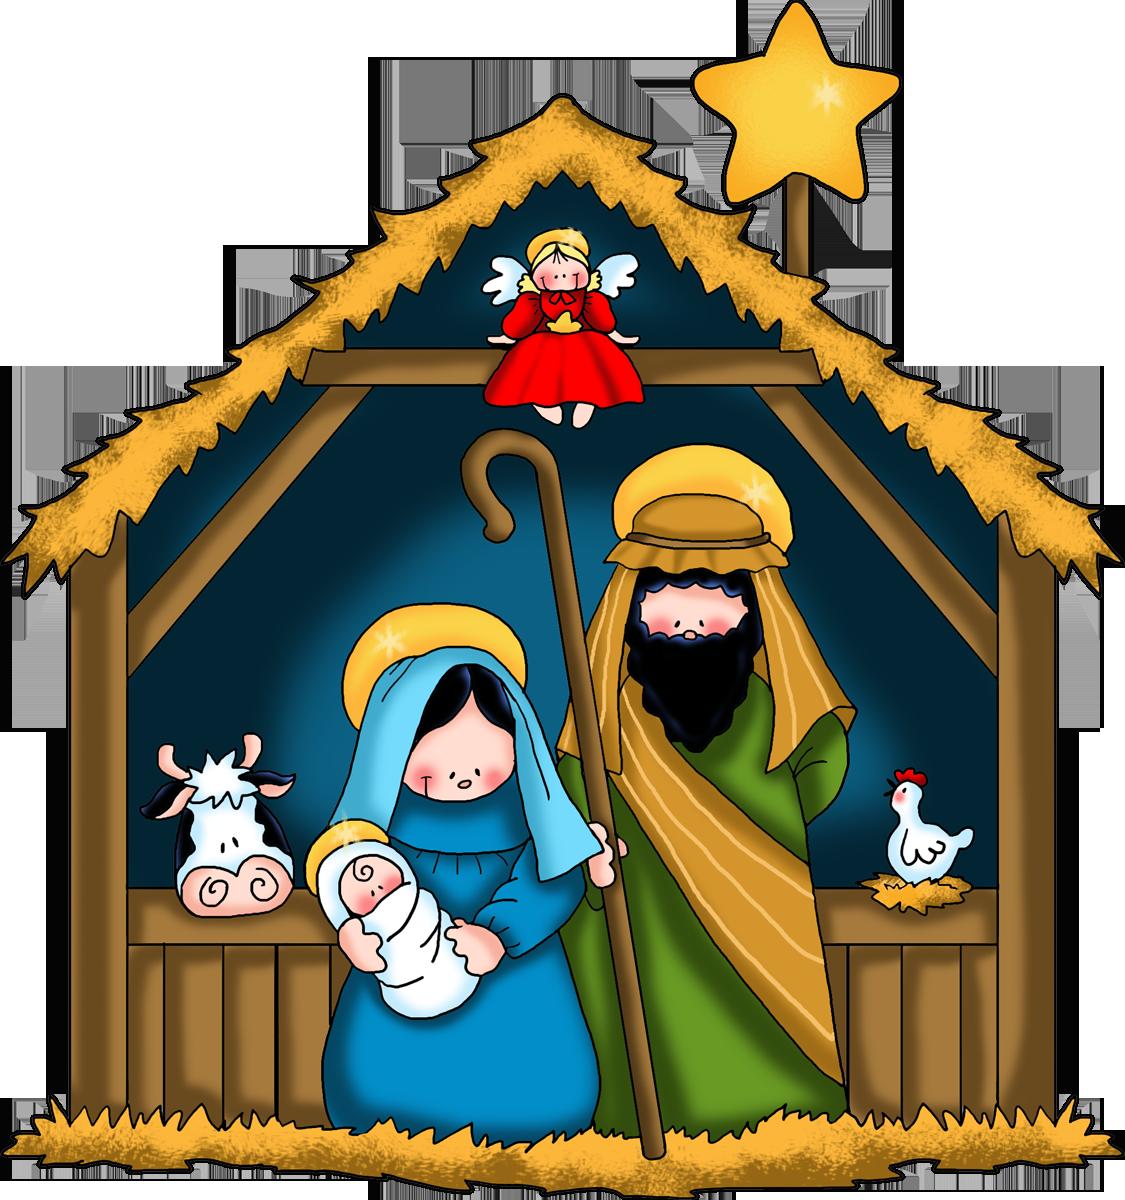 Nativity Scene Clipart New Calendar Temp-Nativity Scene Clipart New Calendar Template Site-1